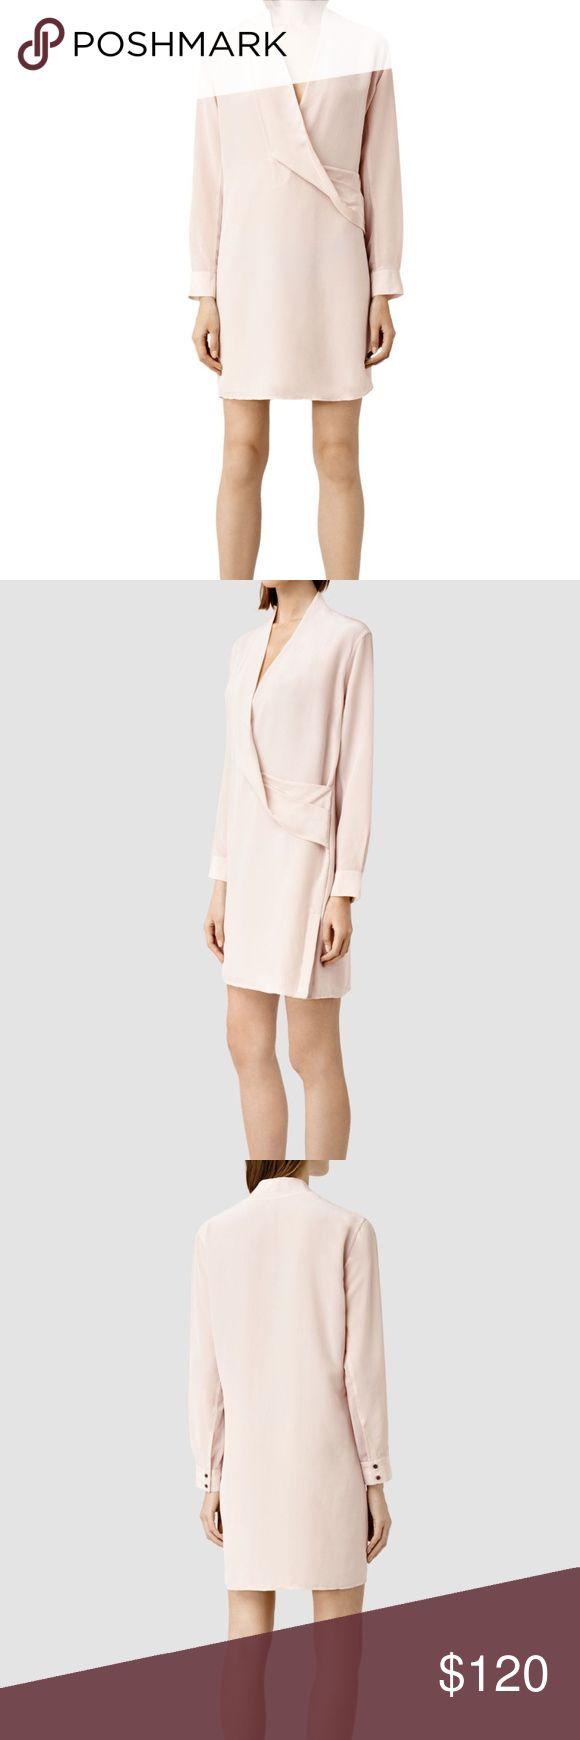 "AllSaints ASH PINK WALTON SHIRT DRESS US 0 2 4 6 8 For Sale is a stunning All Saints Women's Ash Pink ""Walton"" Shirt Dress  Brand New with Tags  Silk Blend - Long Sleeve  Color: Ash Pink All Saints Dresses Mini"